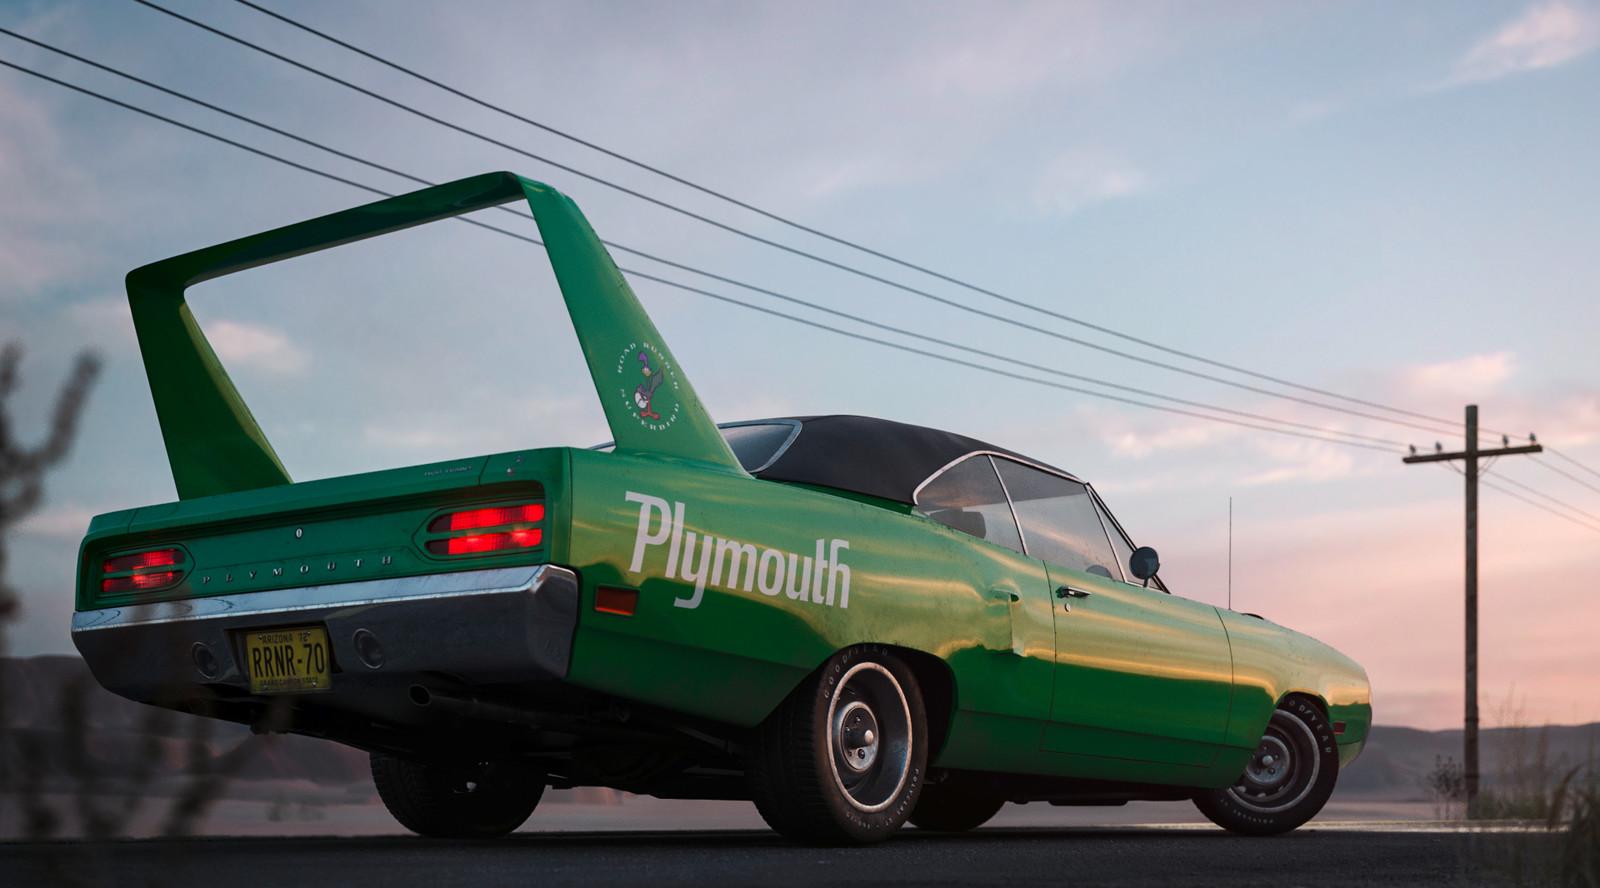 Plymouth Superbird